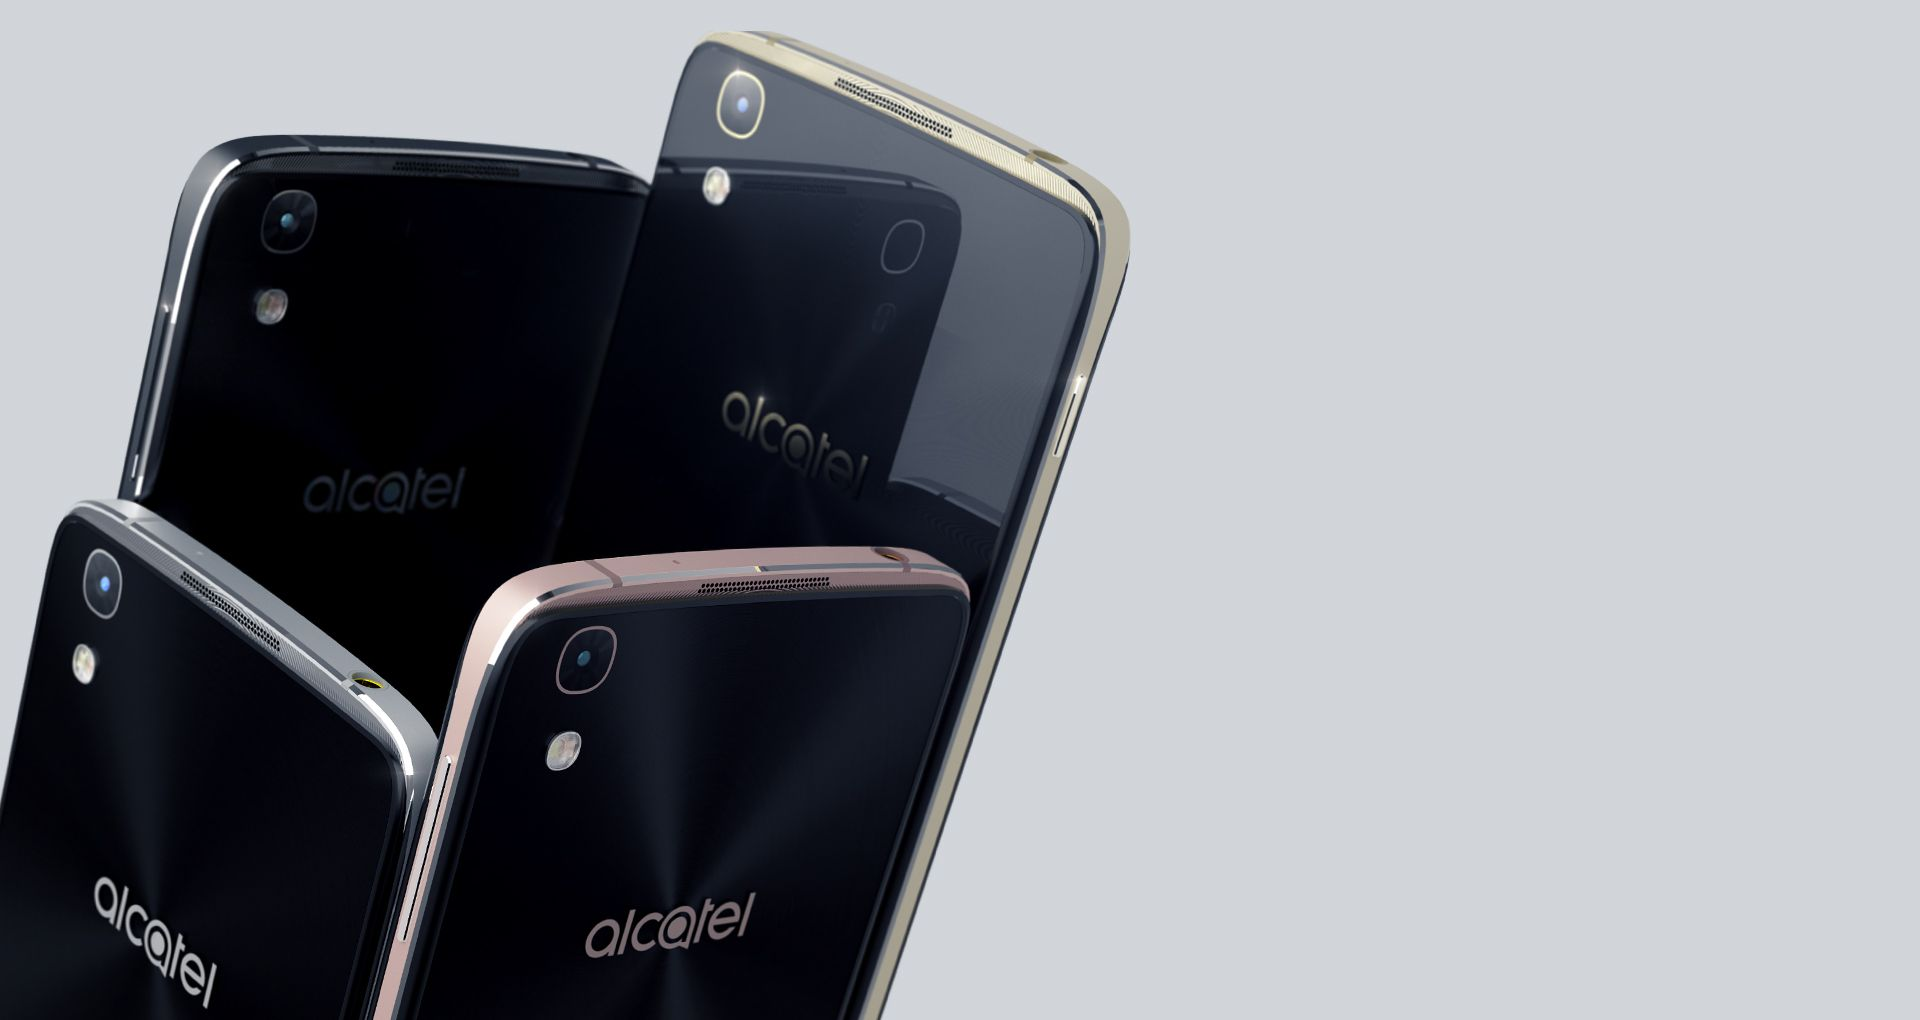 Alcatel mobile   Global - IDOL4 - Smartphones   Techere